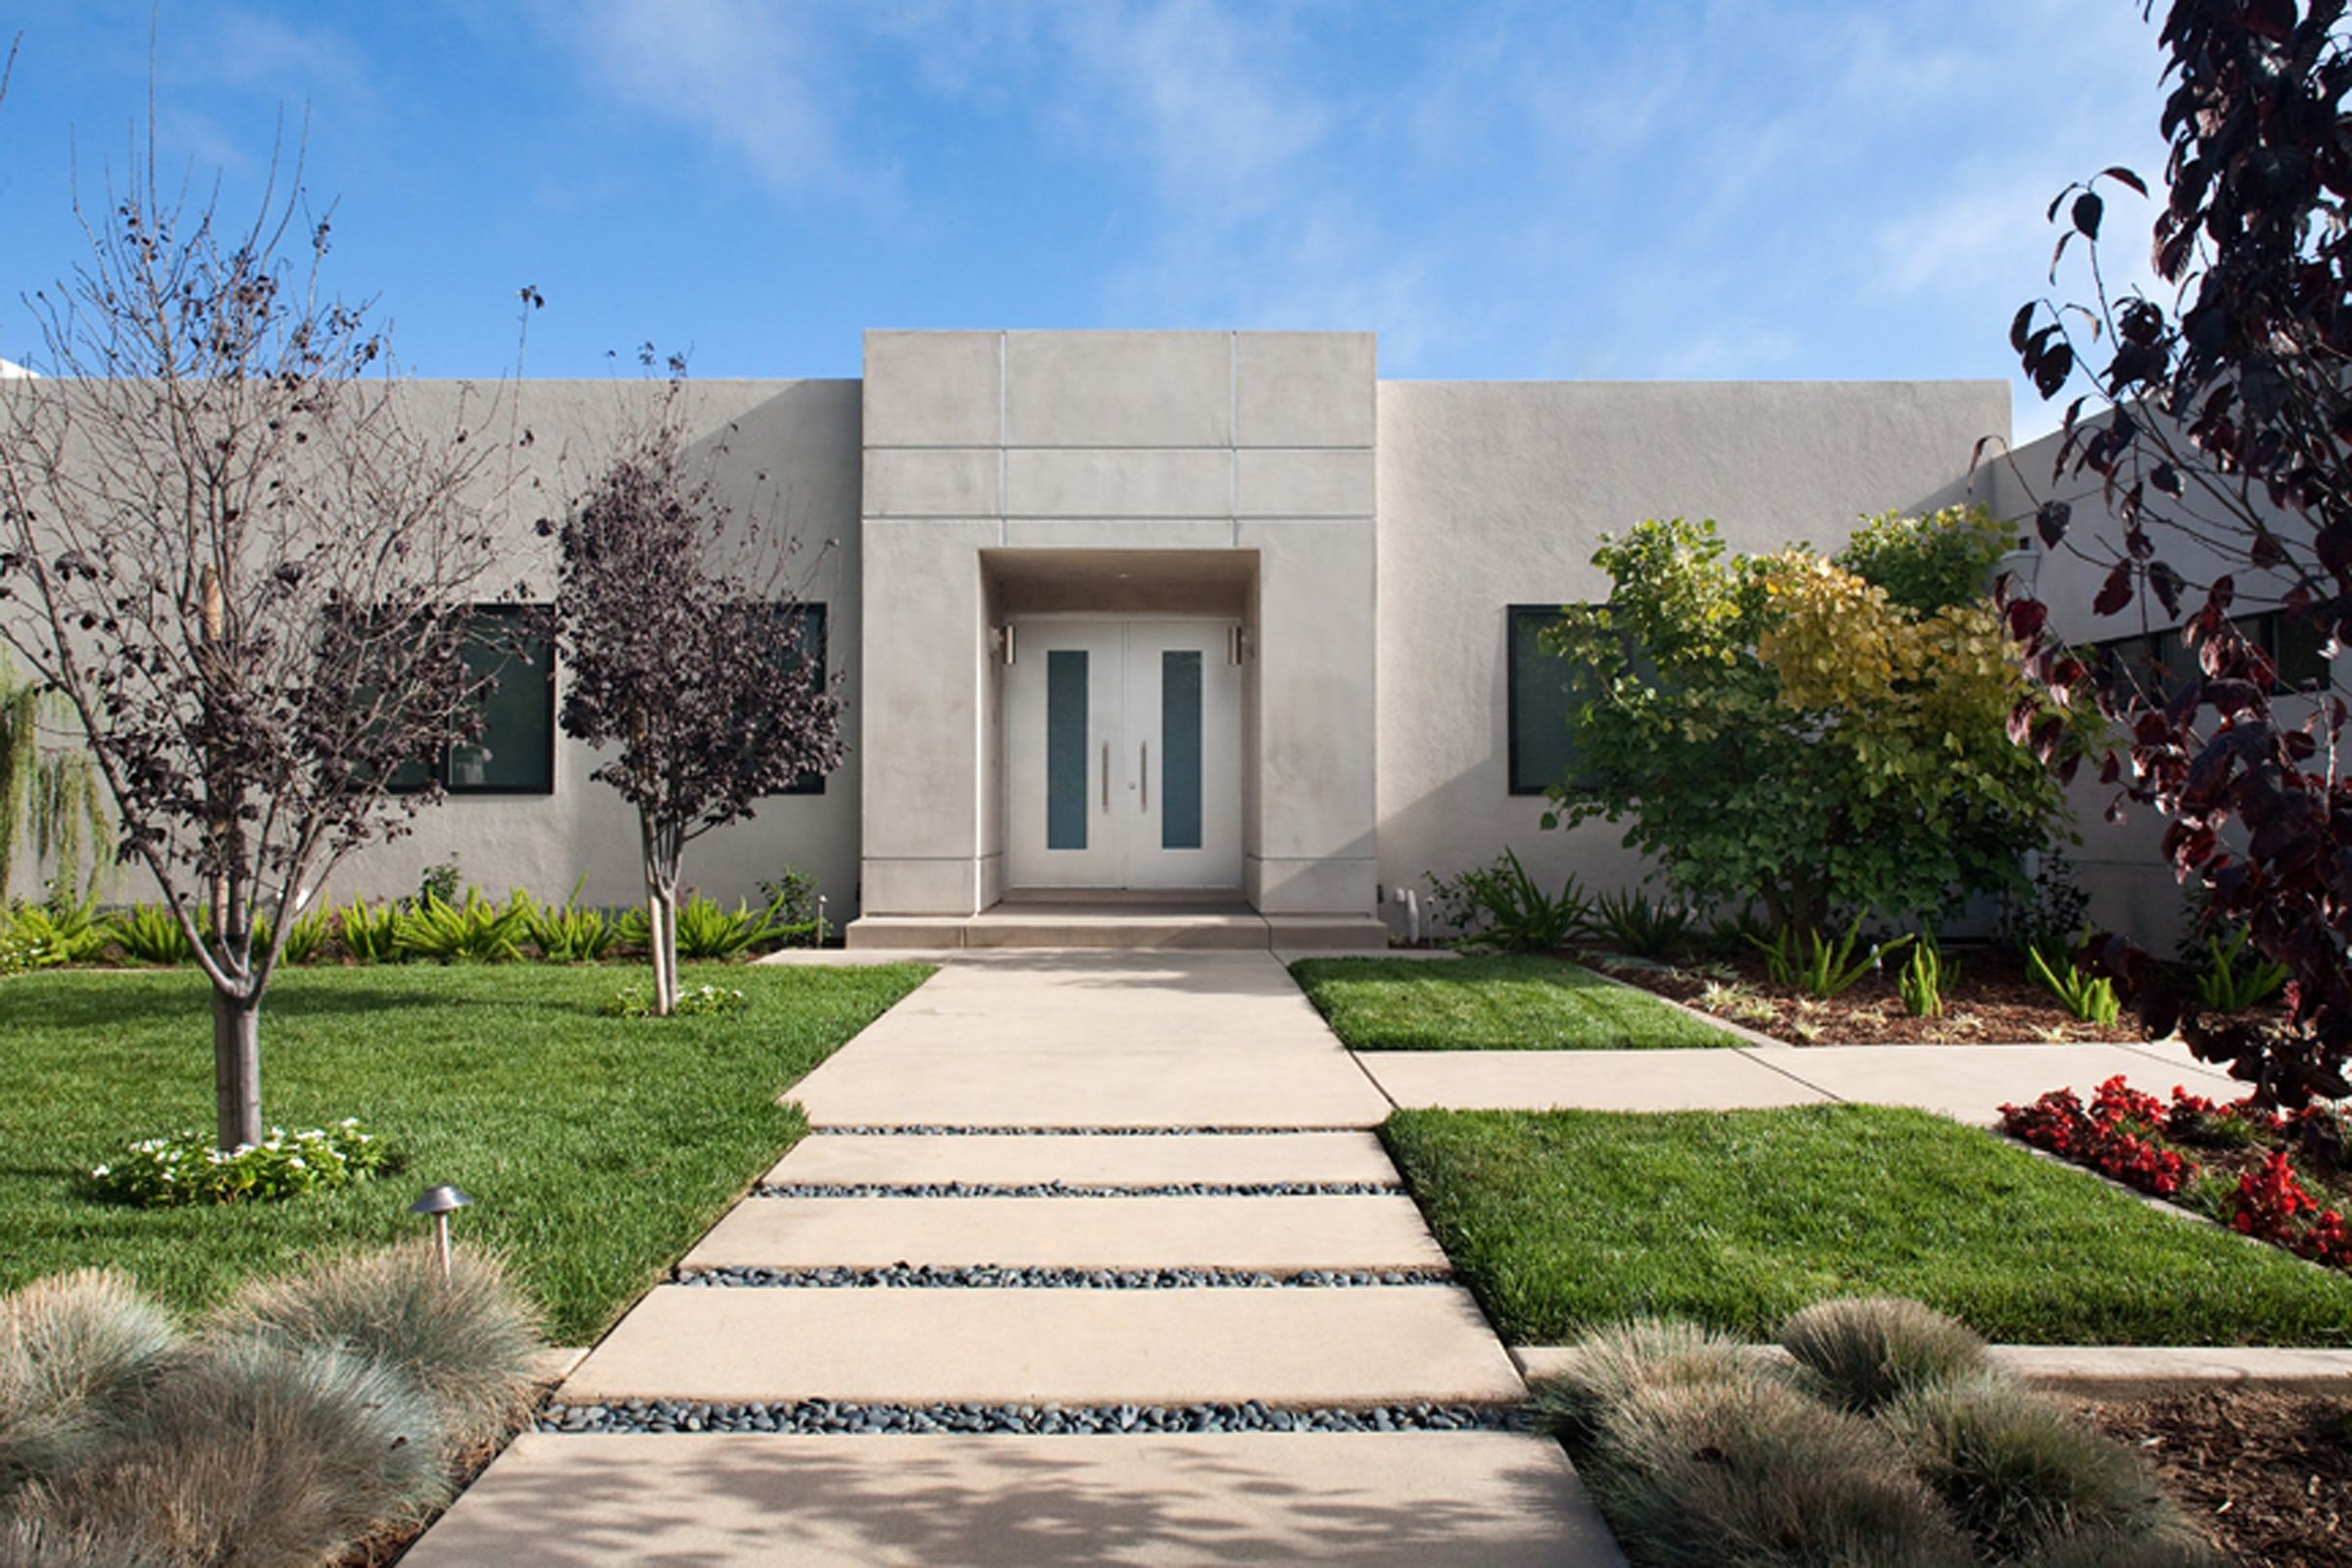 30 stunning modern houses photos of modern exteriors rh elledecor com contemporary design houses pictures contemporary design tiny houses